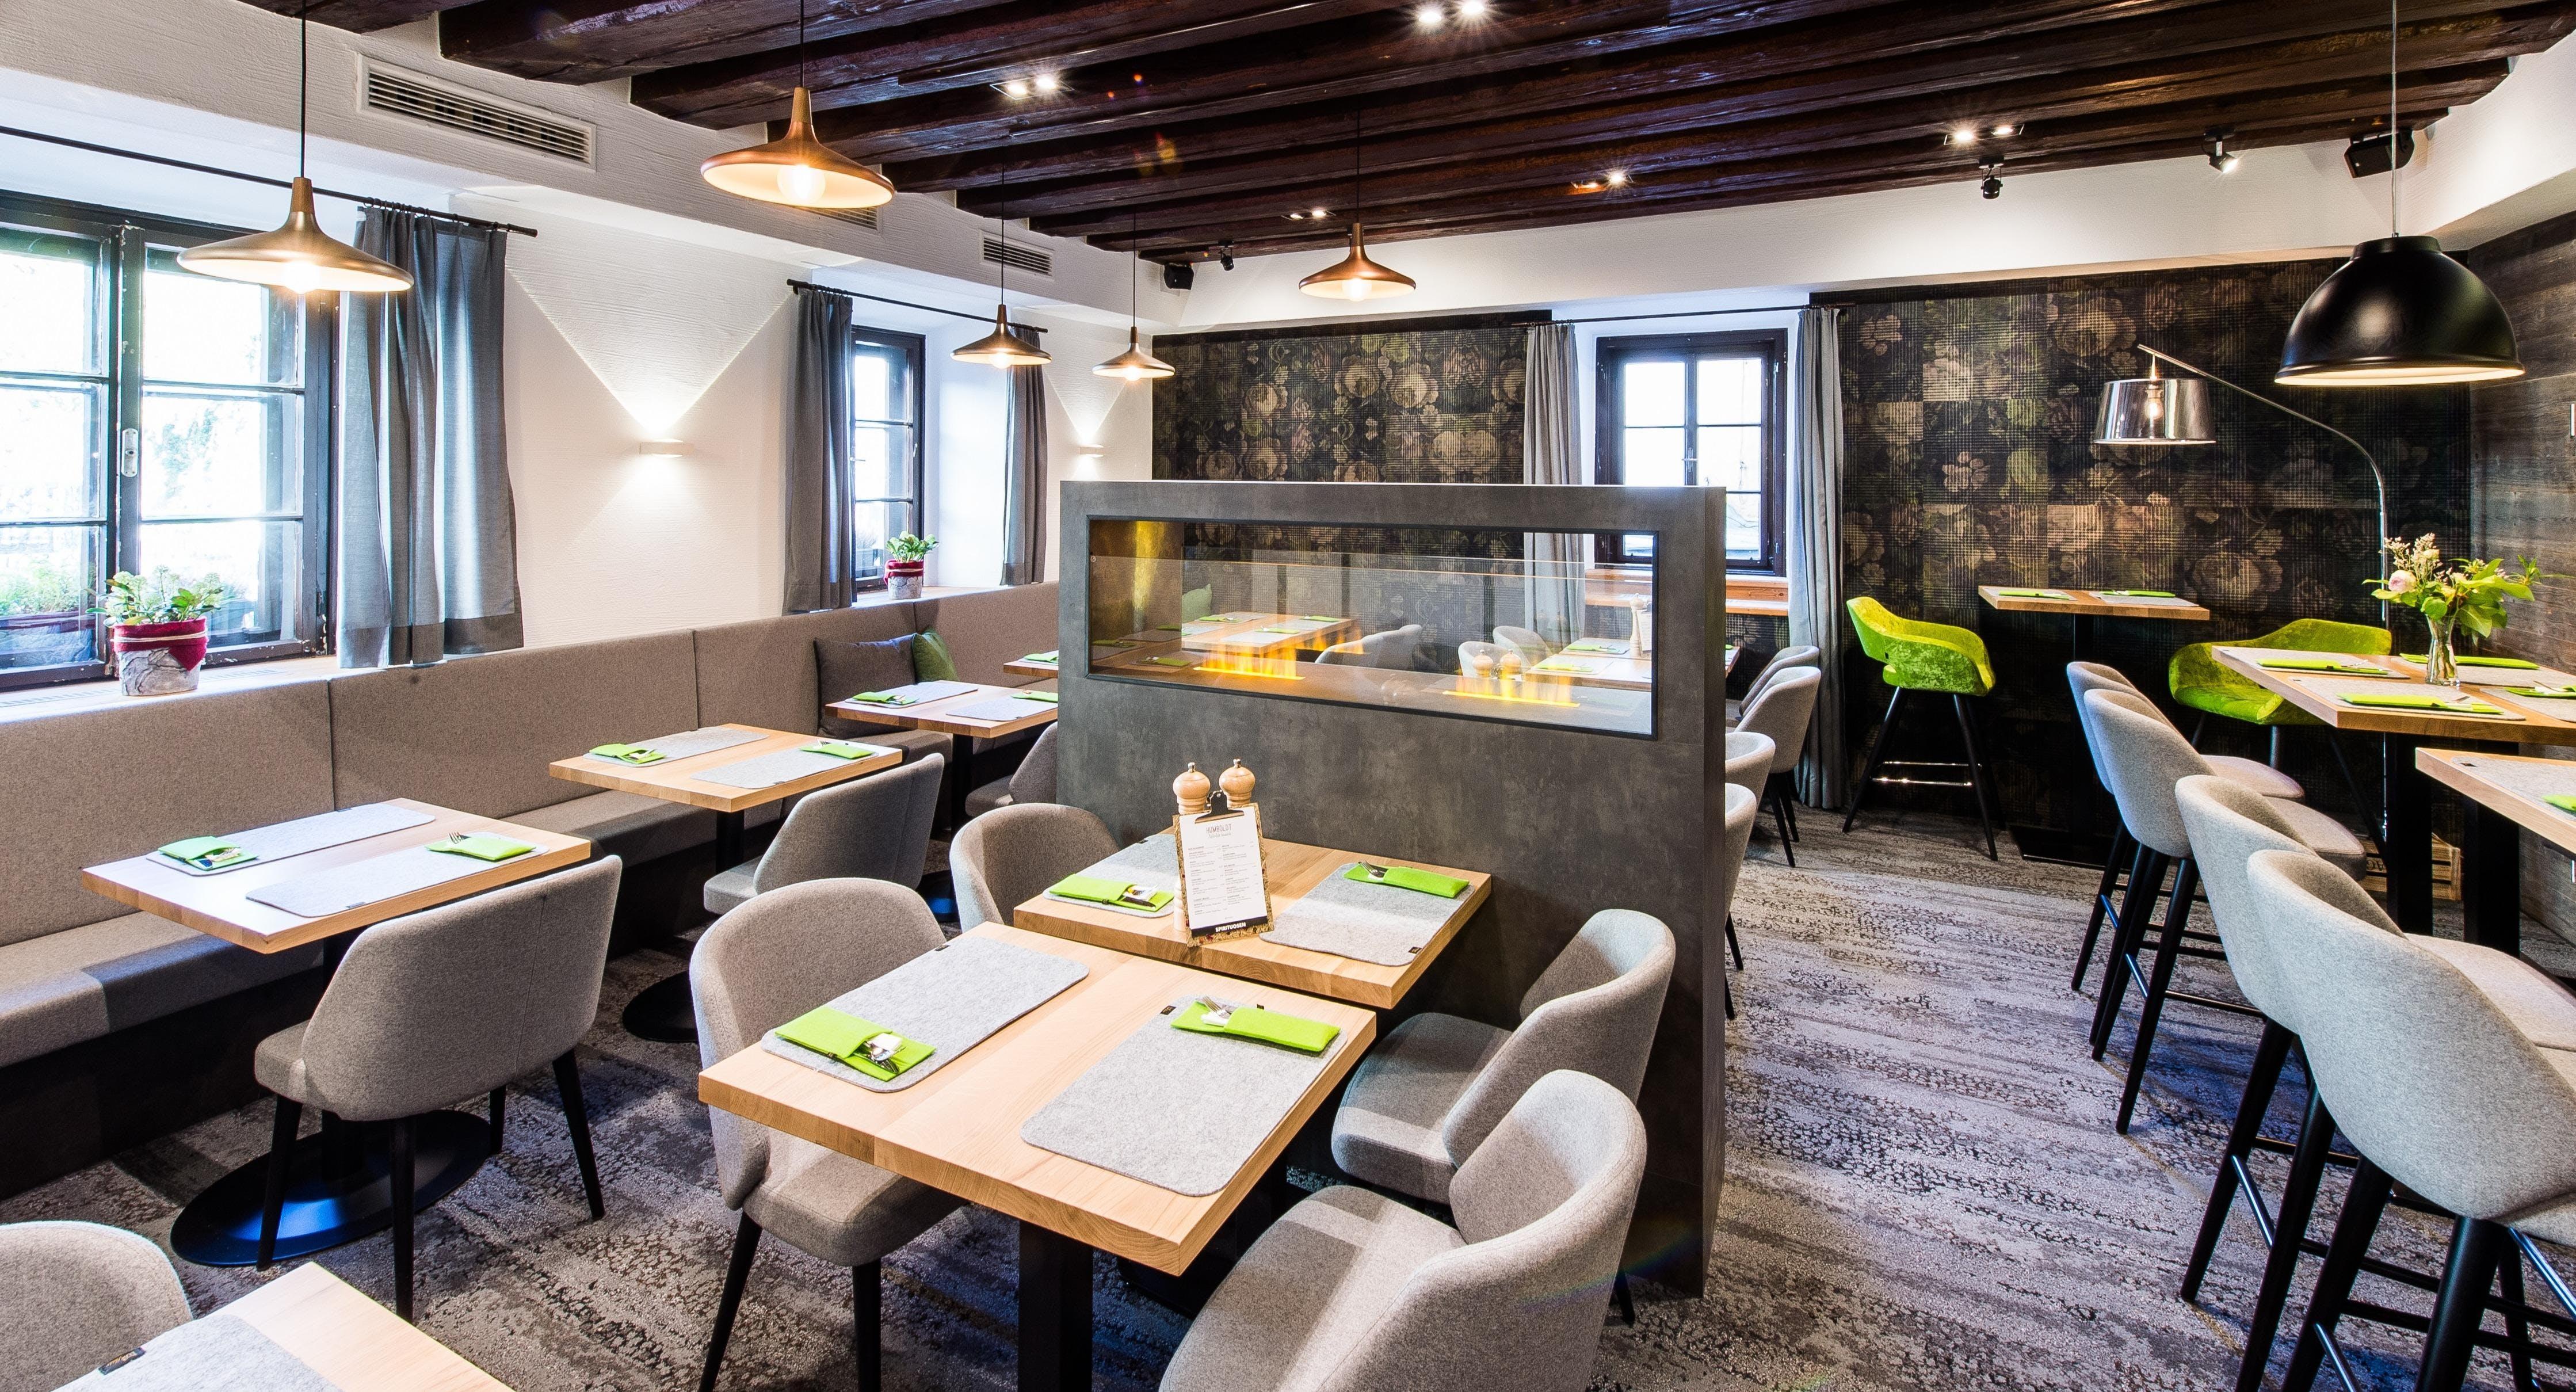 Humboldt Restaurant & Bar Salzburg image 1